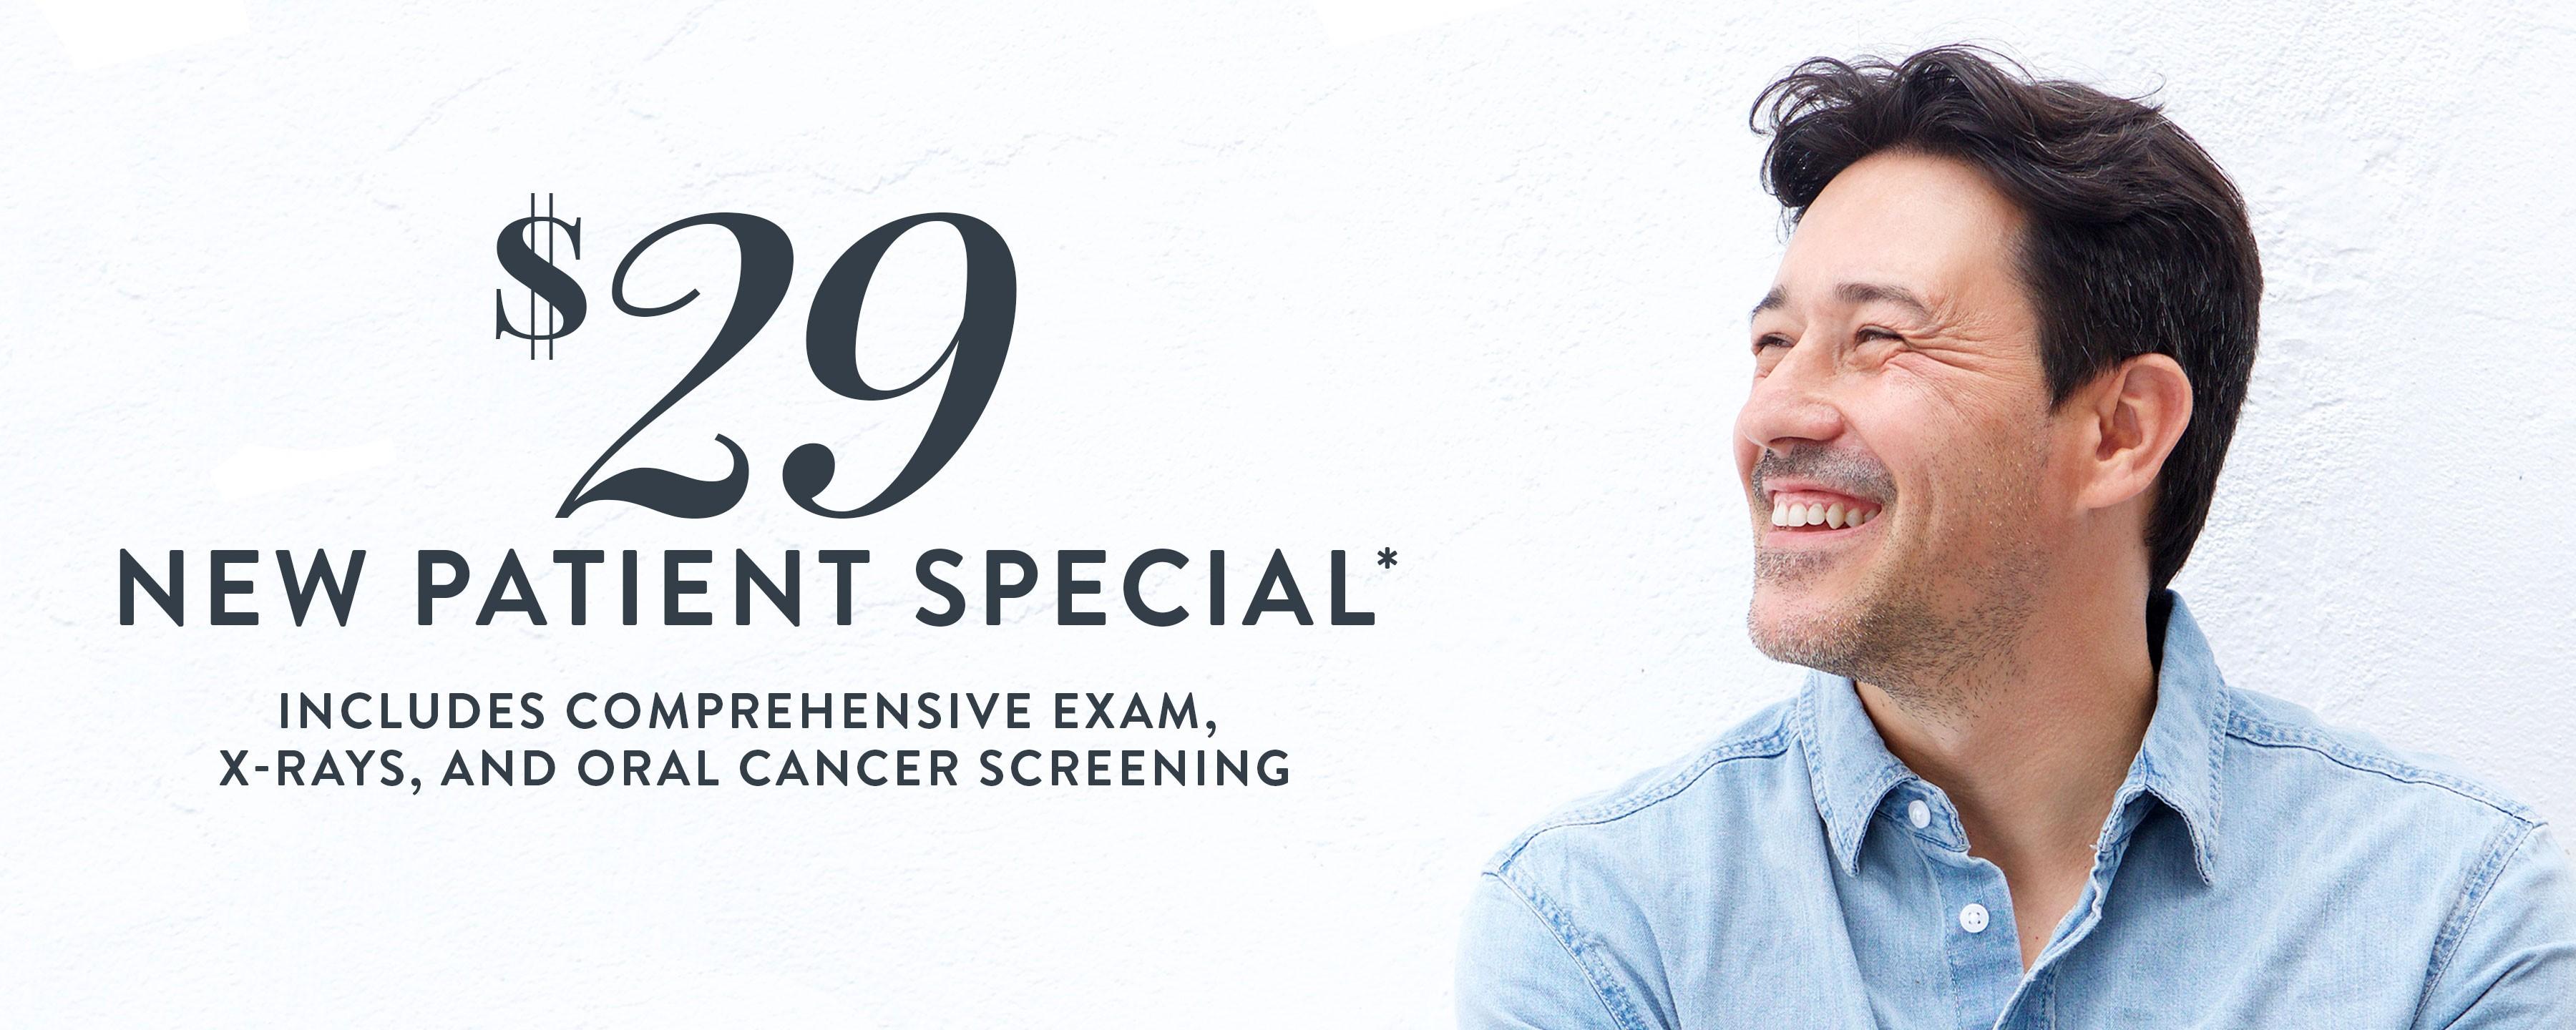 $29 New Patient Special*